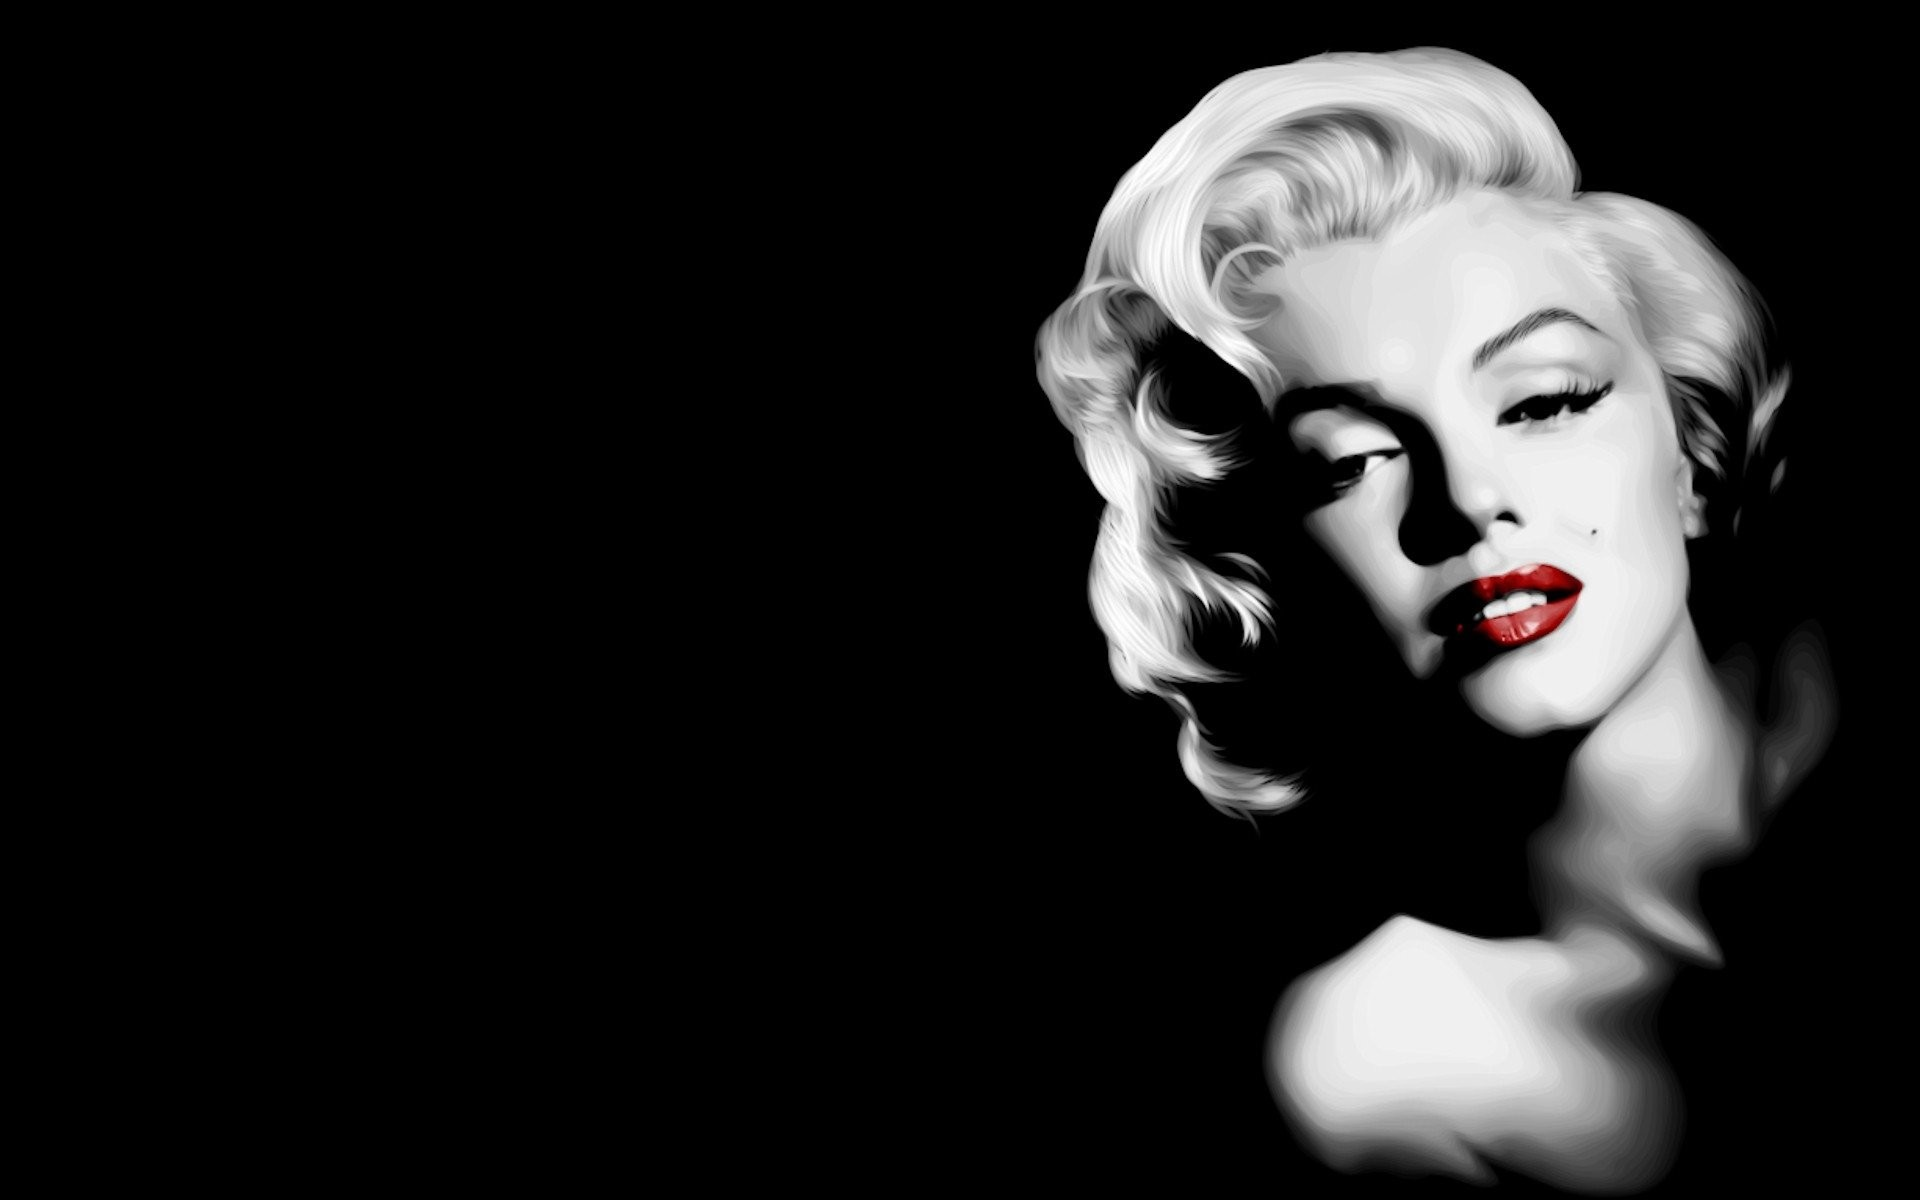 Res: 1920x1200, Celebrity - Marilyn Monroe Wallpaper